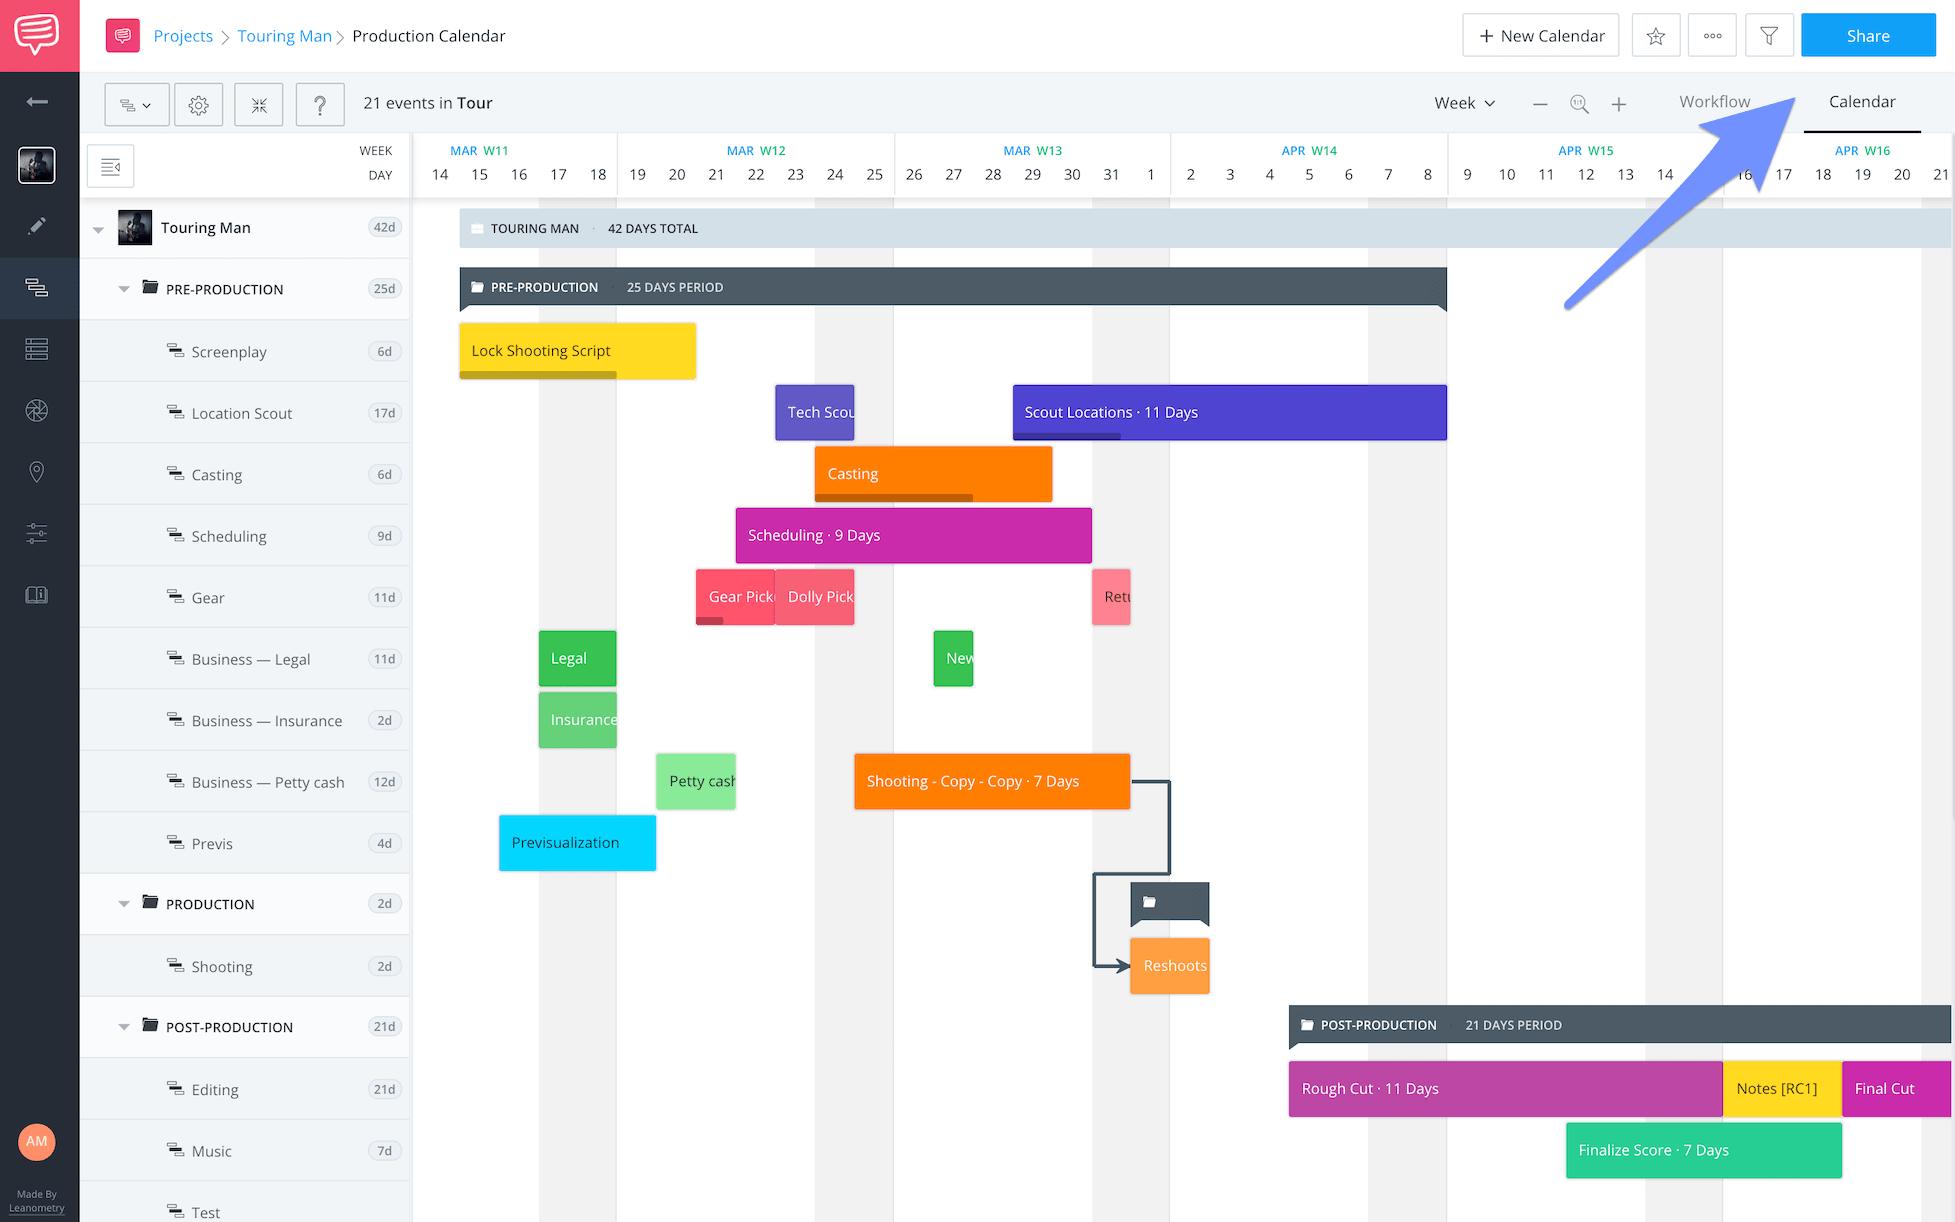 Digital Communications Production Calendar